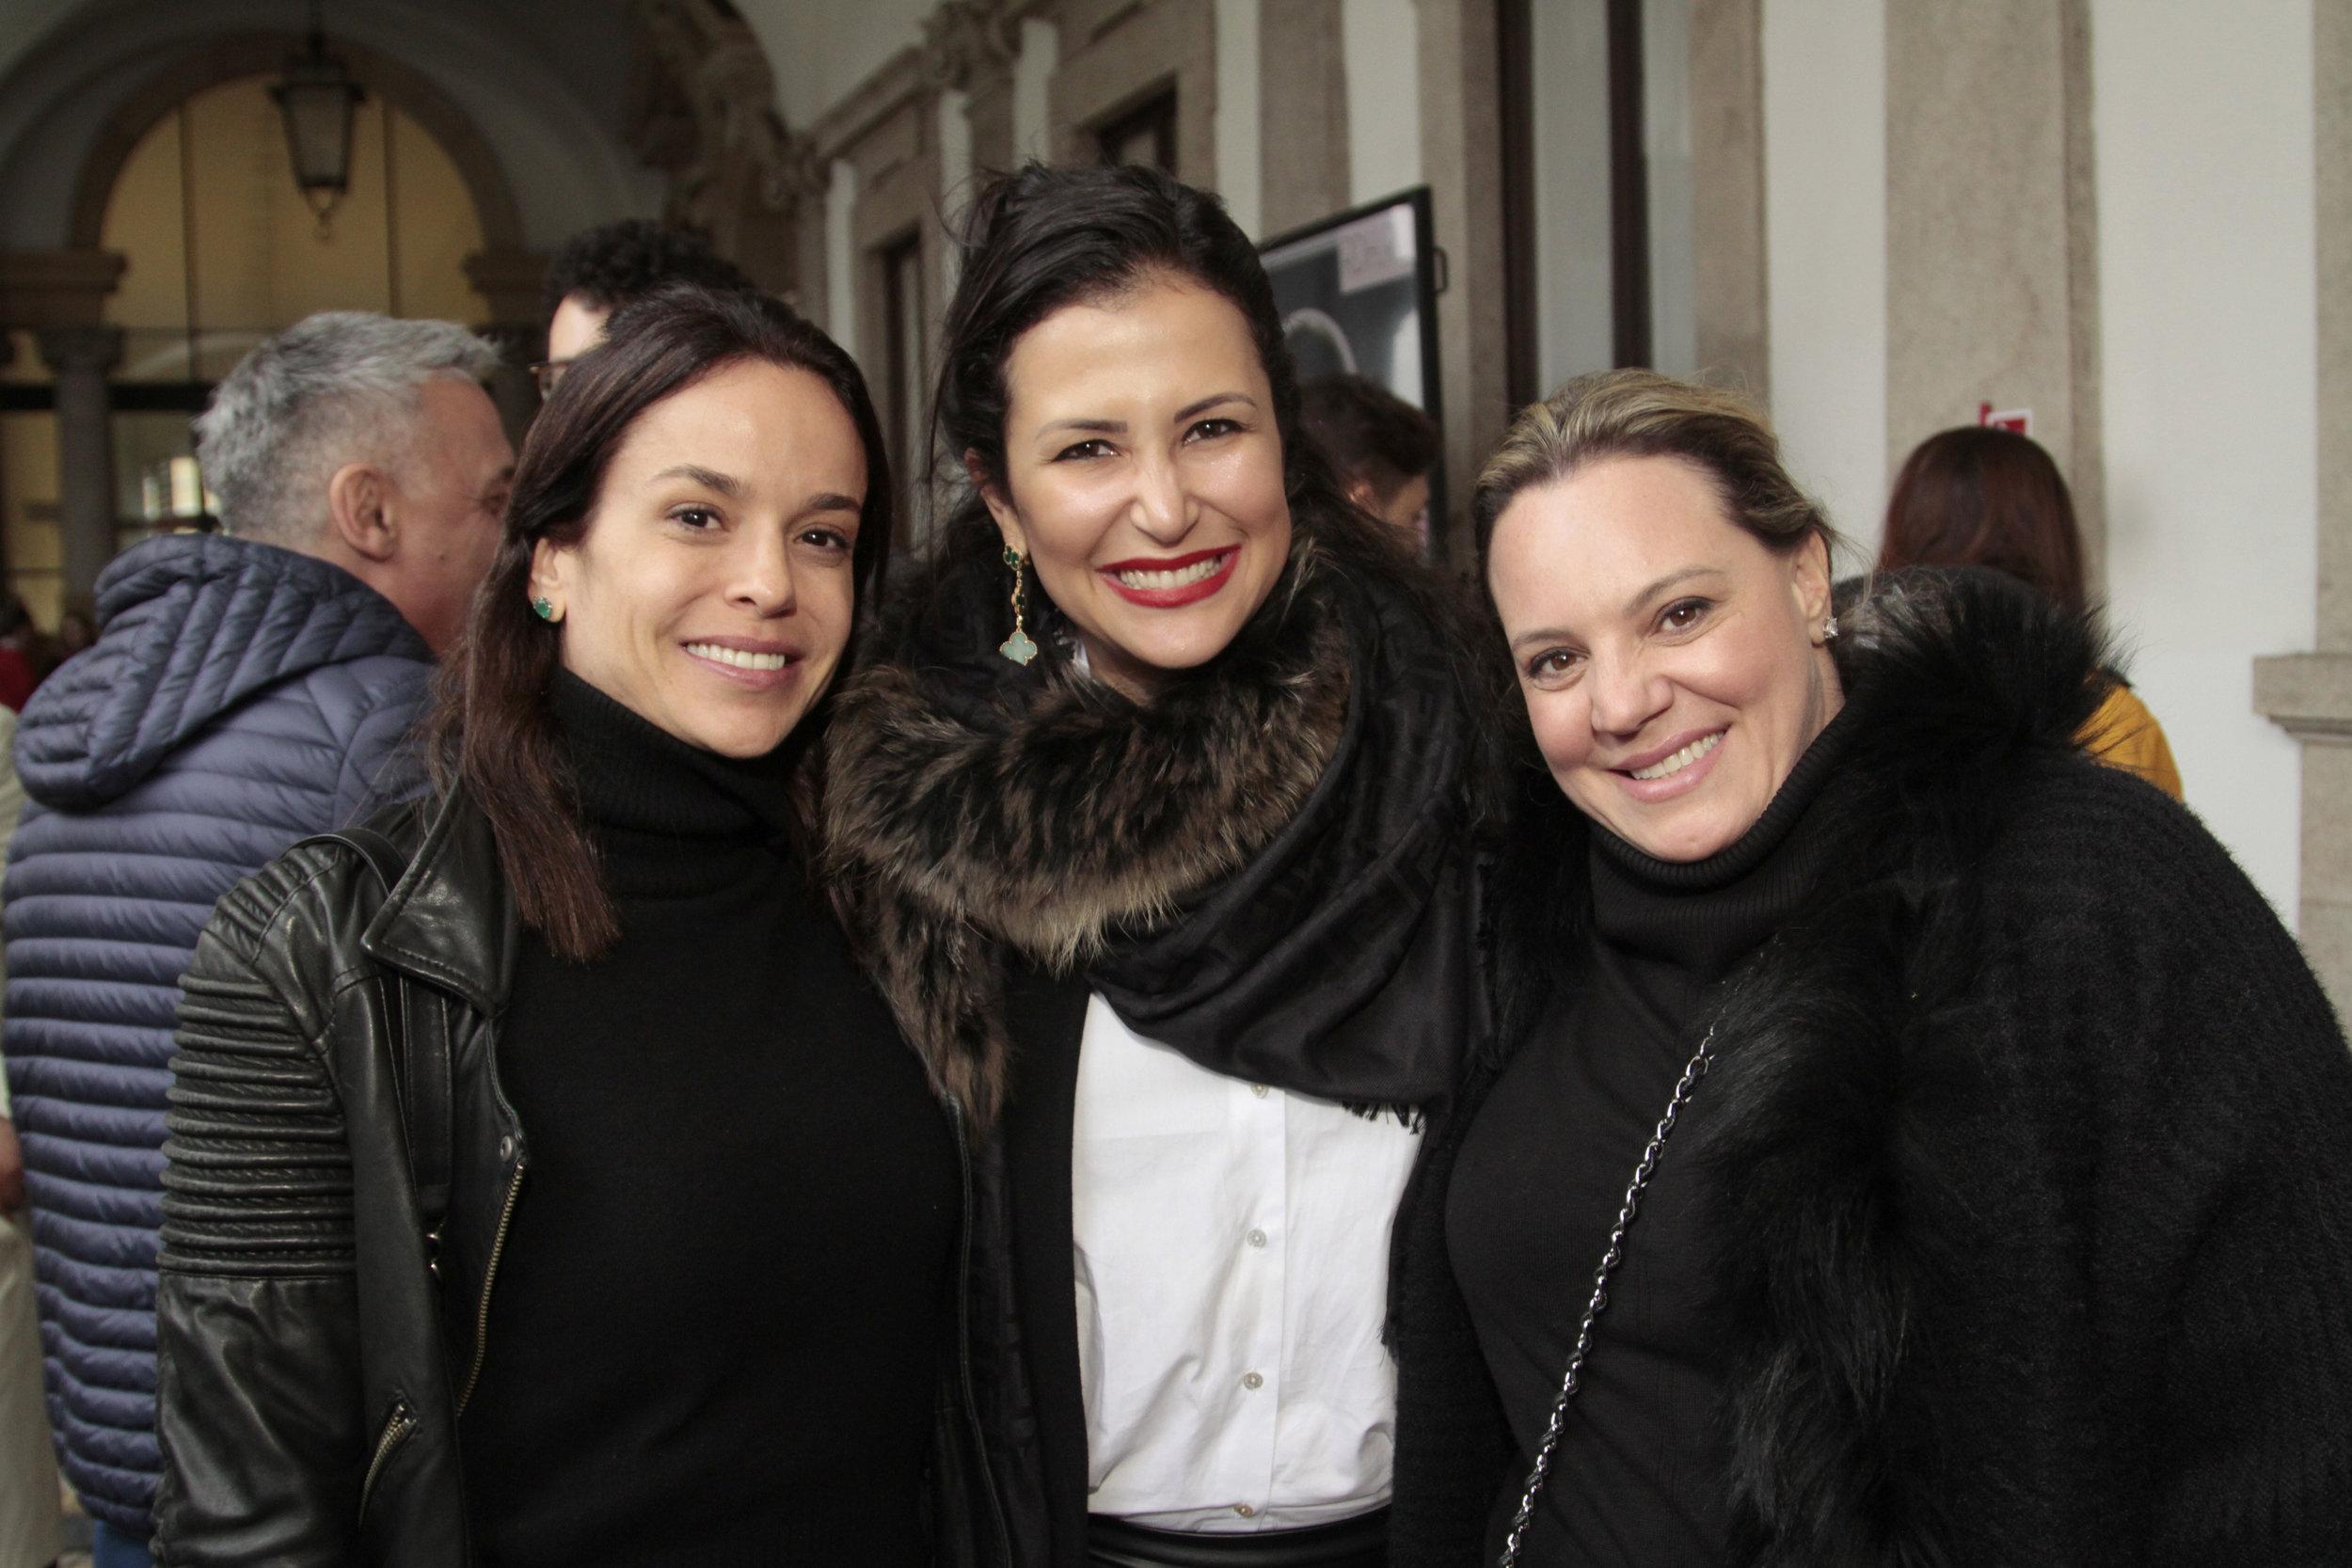 Karina Granella, Vivian Coser e Camila Avesani